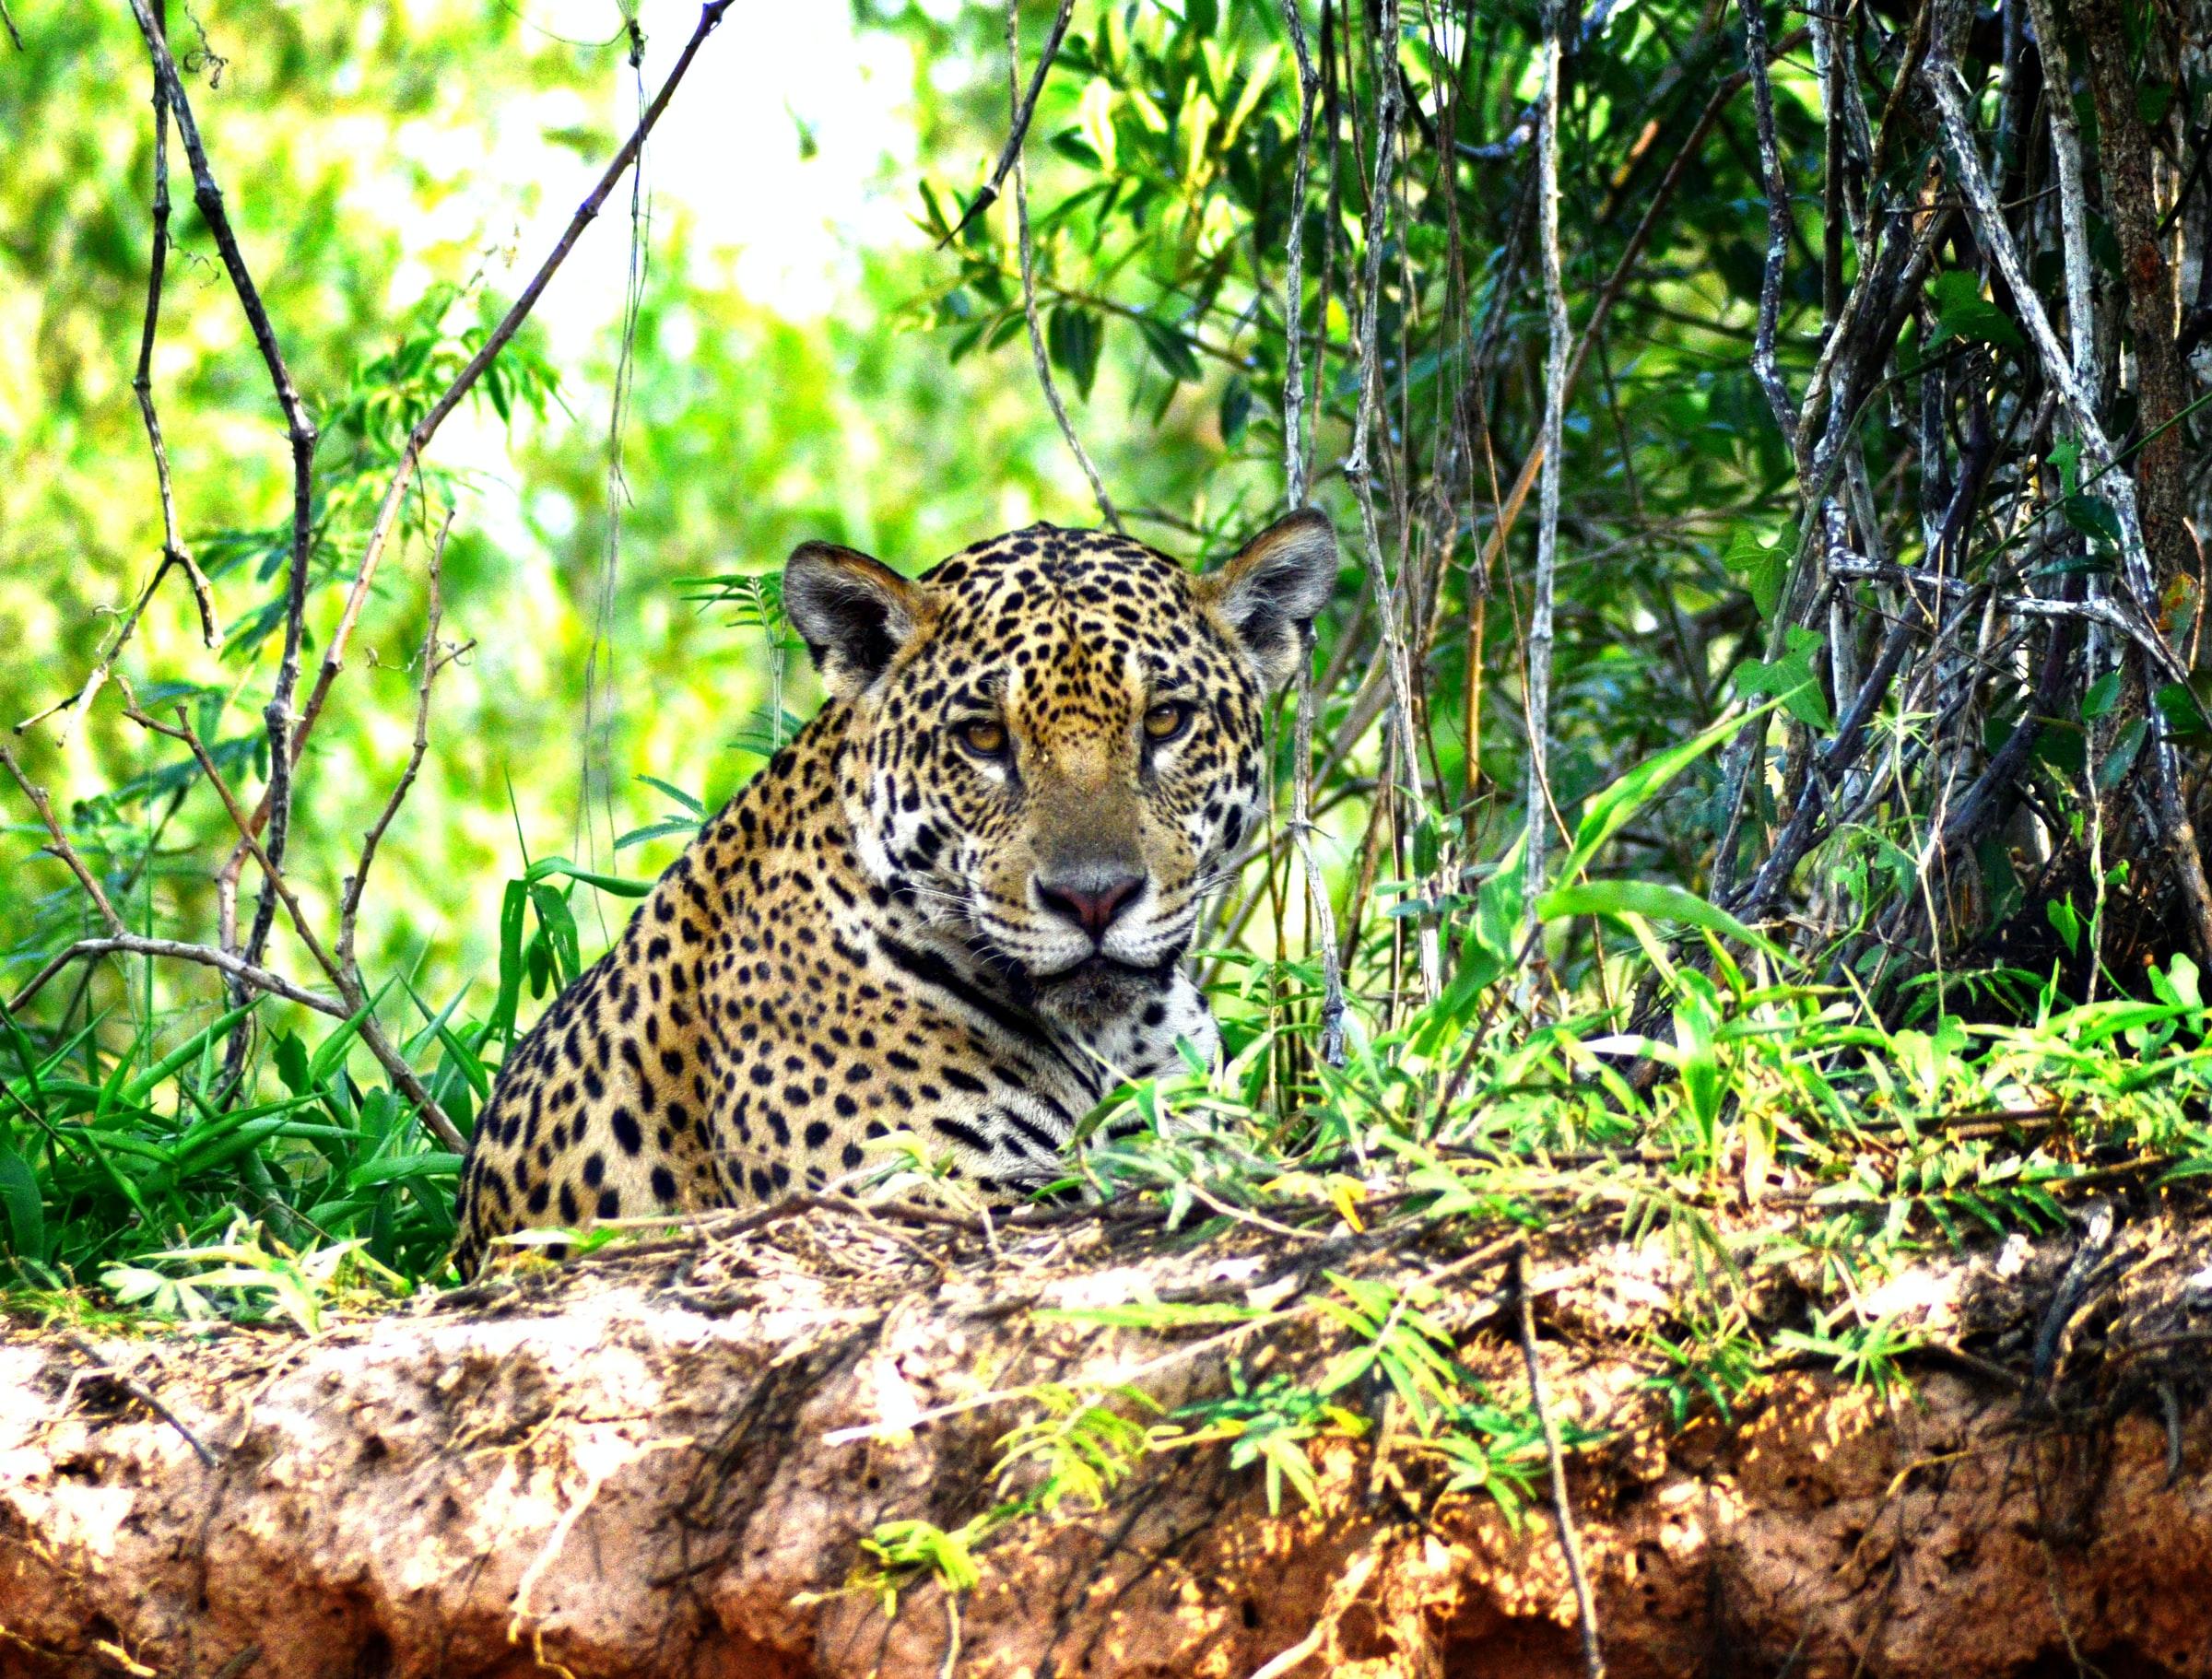 Een Jaguar in Pantanal (Brazilië)